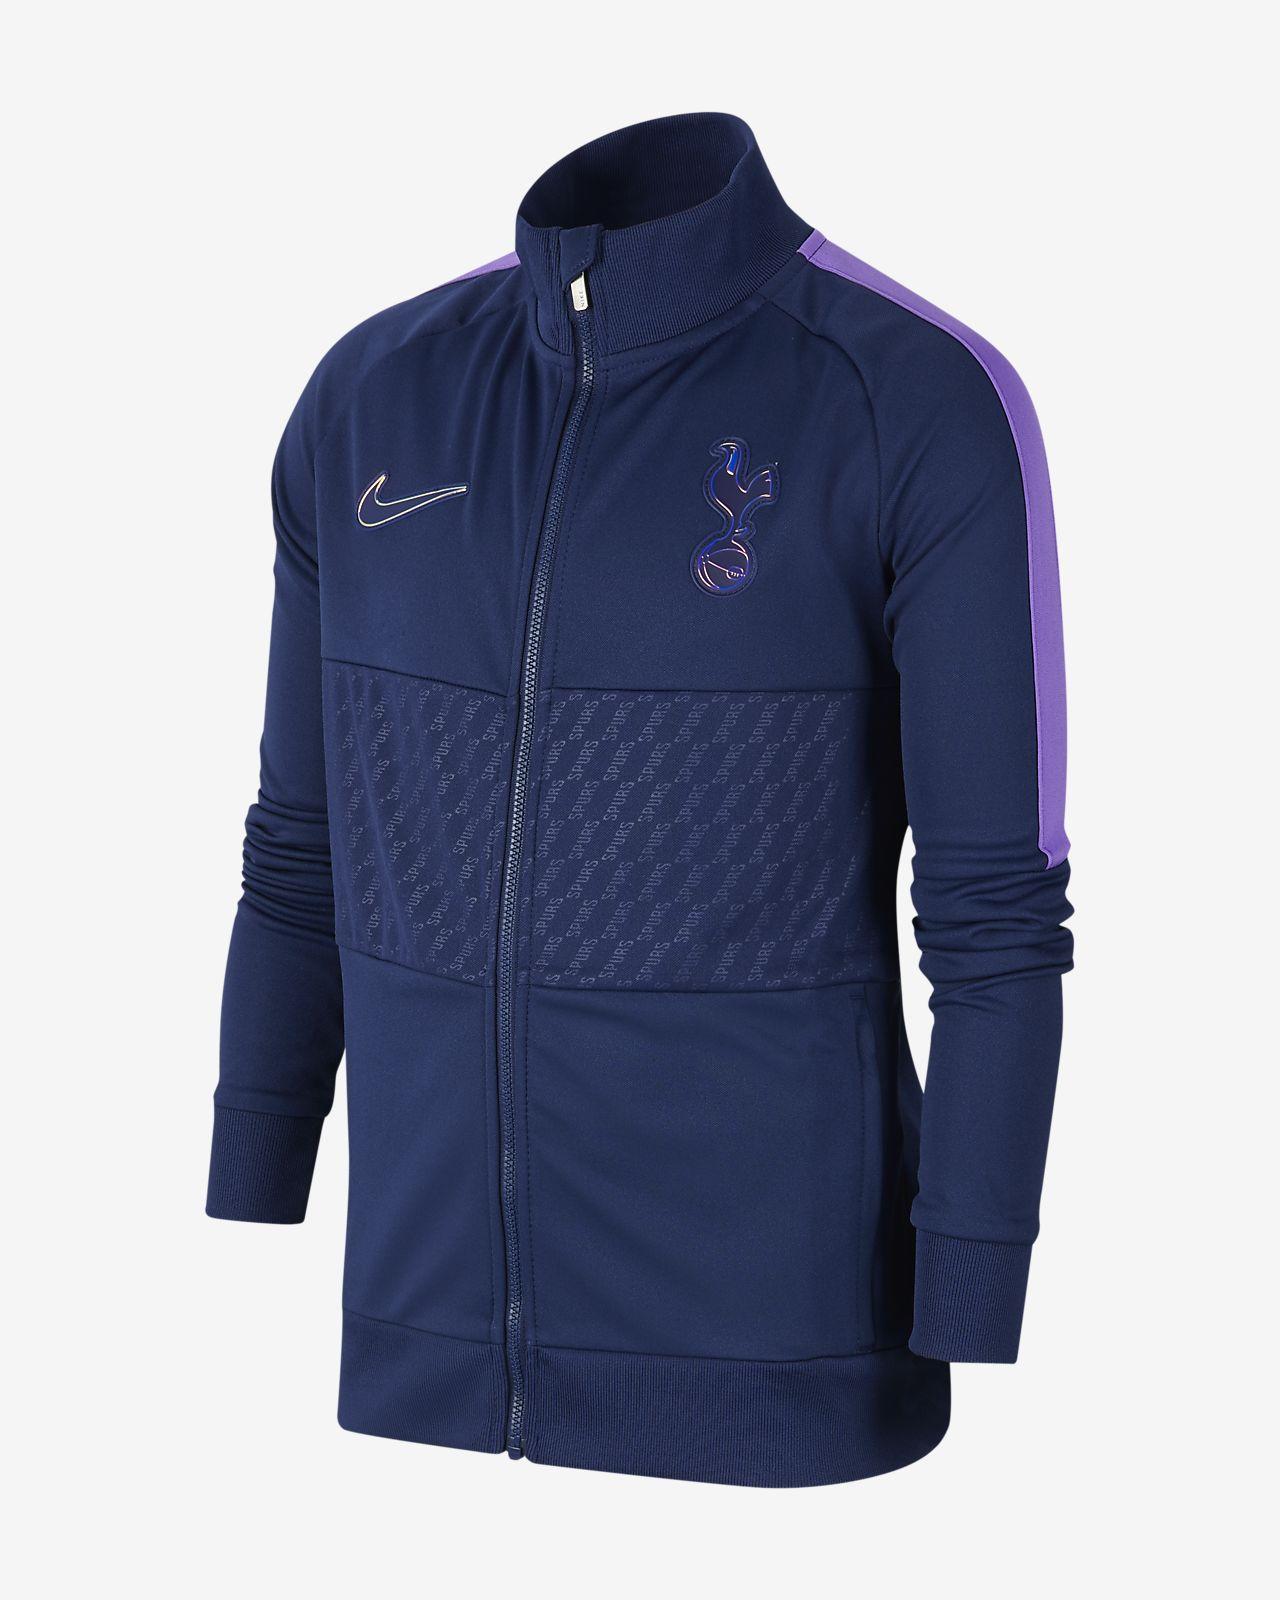 Tottenham Hotspur-jakke til store børn